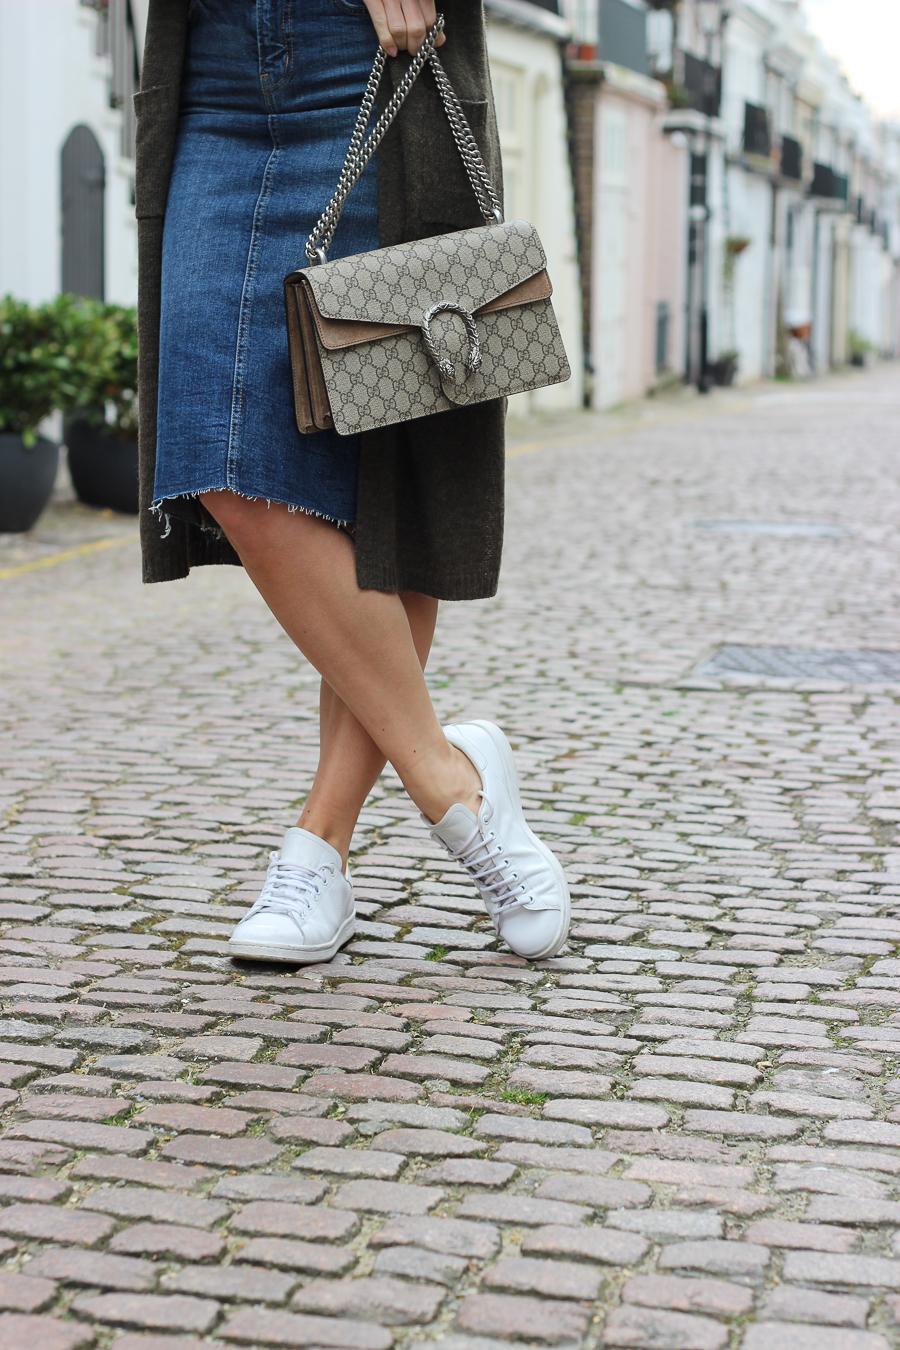 Clutch and carry on - uk fashion blogger - uk travel blogger - sabrina chakici - matalan cardigan, zara denim midi skirt, gucci dionysus supreme-9